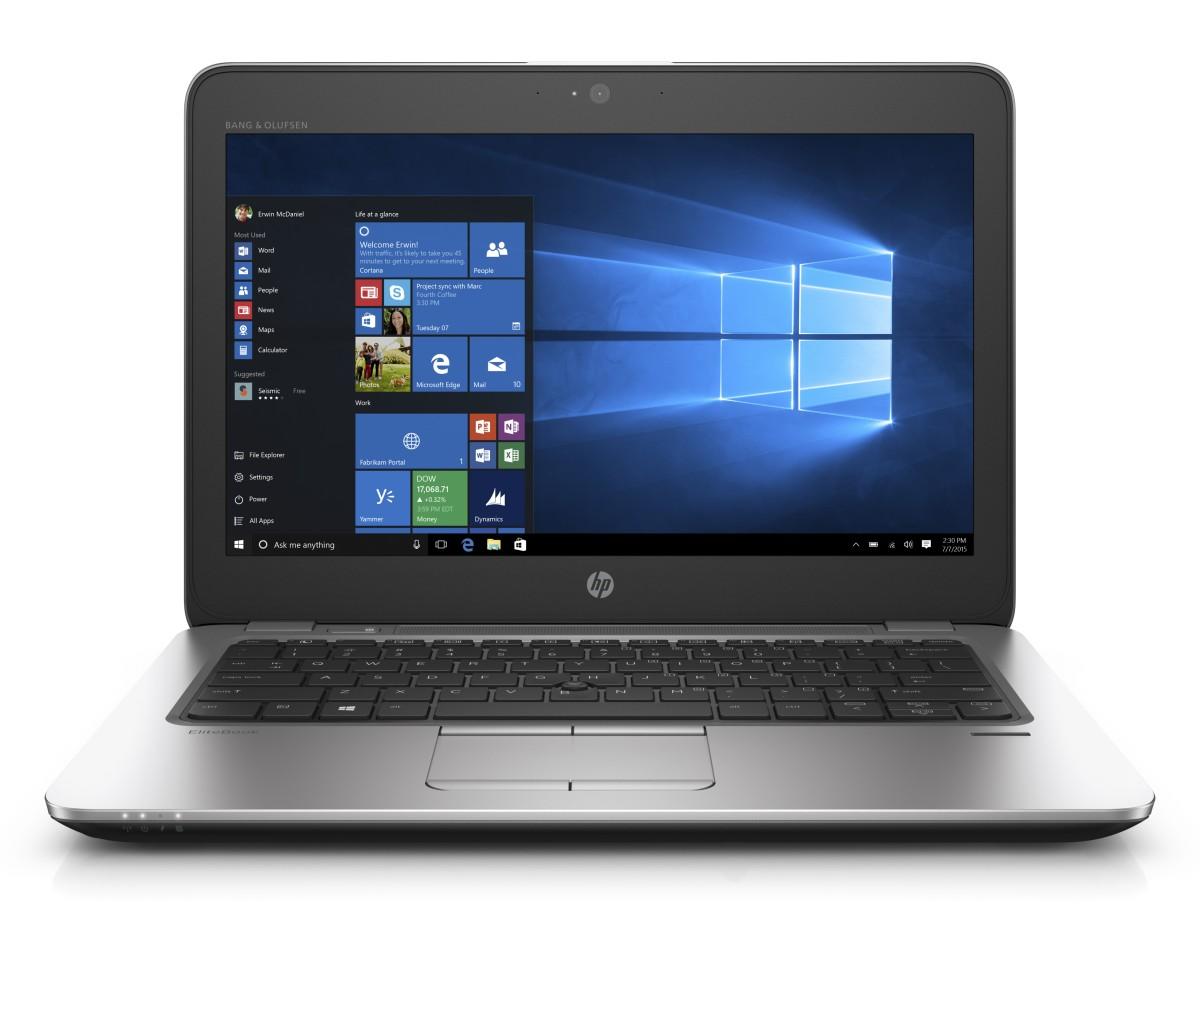 "HP EliteBook 820 G4 i5-7200U/8GB/256GB SSD TurboG2/12.5"" FHD/backlit keyb /Win 10 Pro"